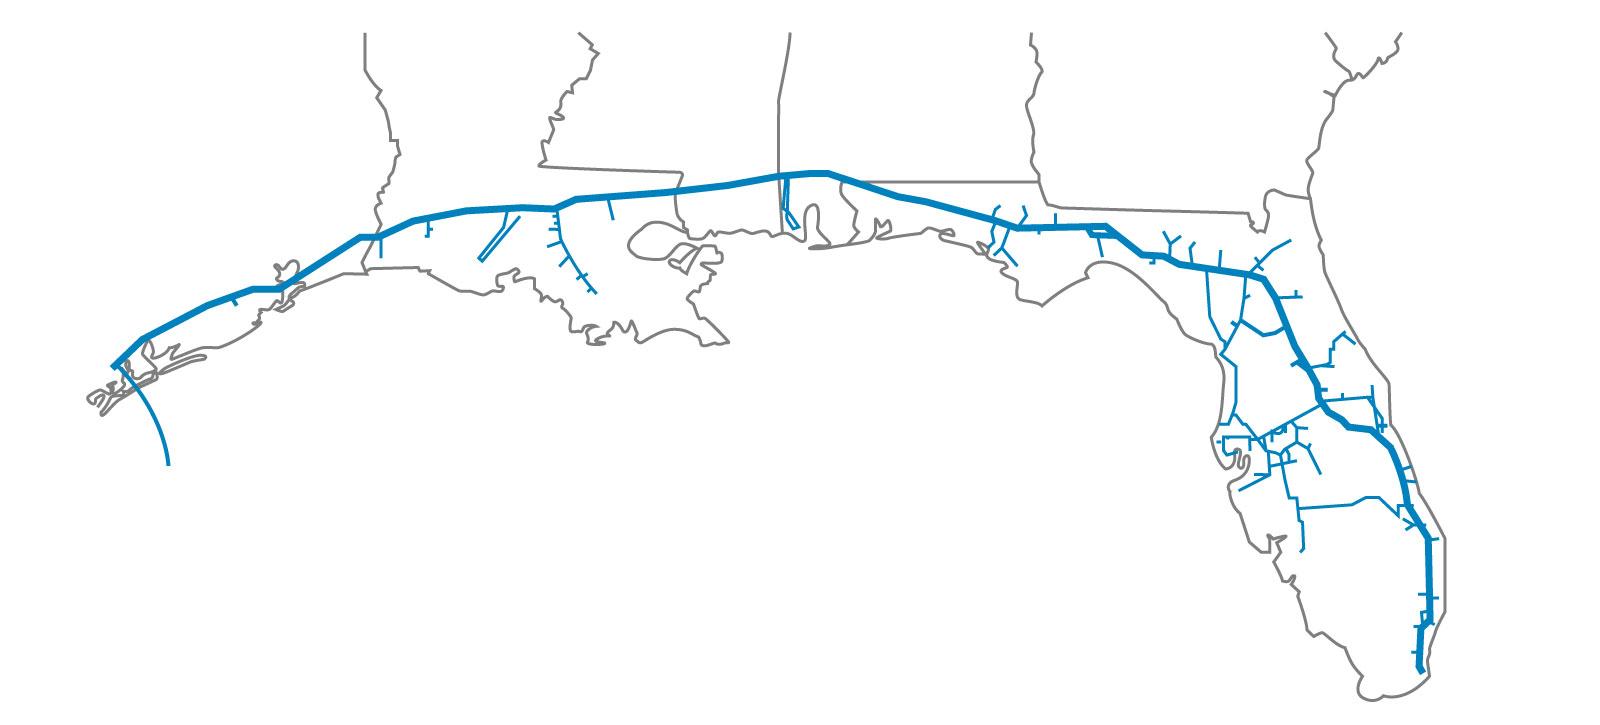 Florida Gas Transmission Map